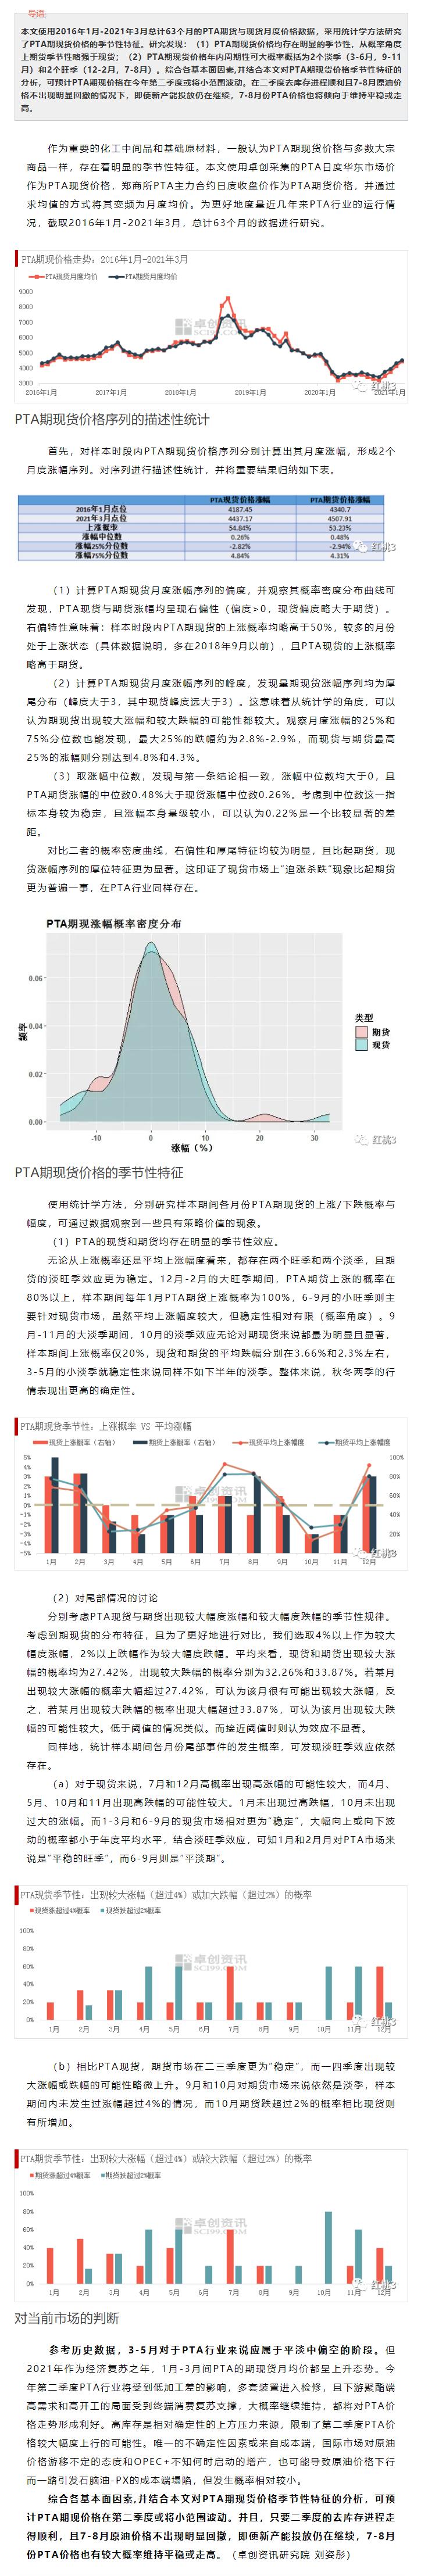 FireShot Capture 055 - PTA行业量化研究系列:PTA价格的季节性特征 - mp.weixin.qq.com.png